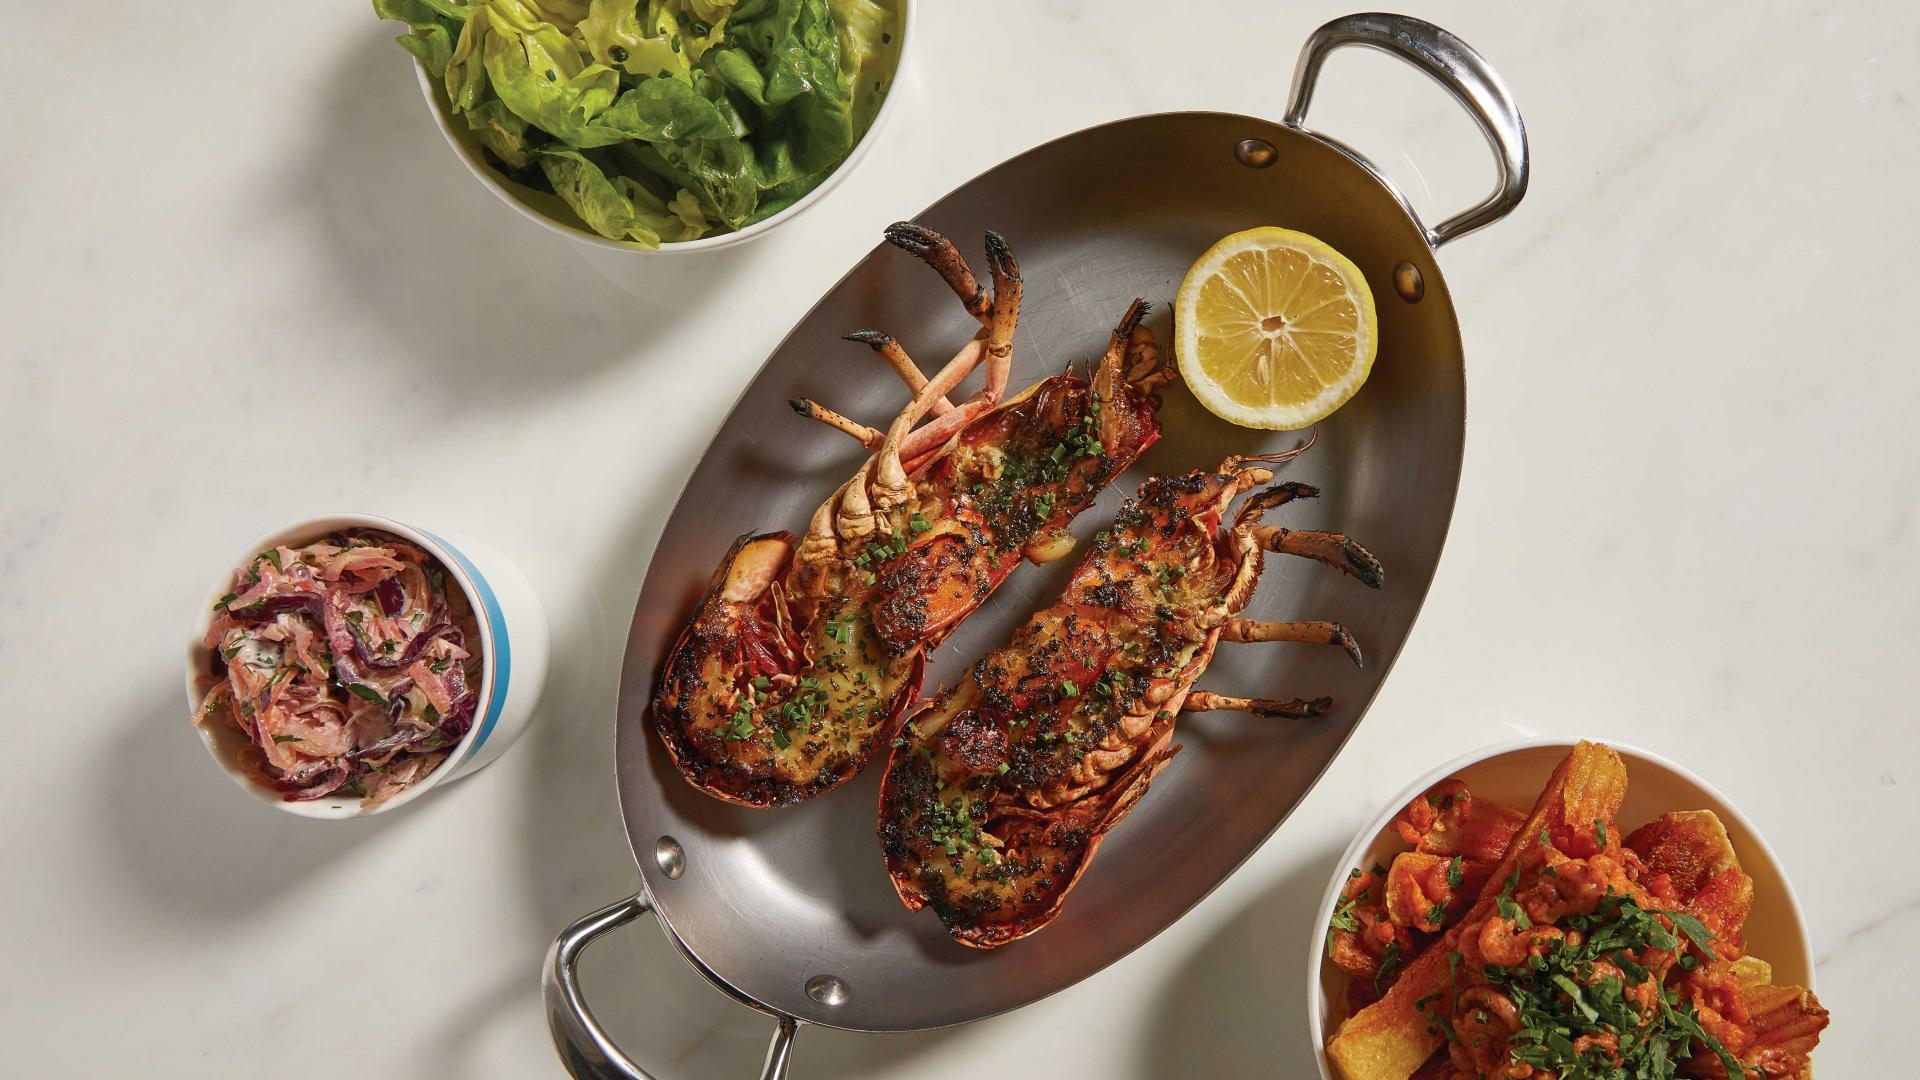 London's best seafood restaurants: Kerridge's Fish & Chips at Harrods